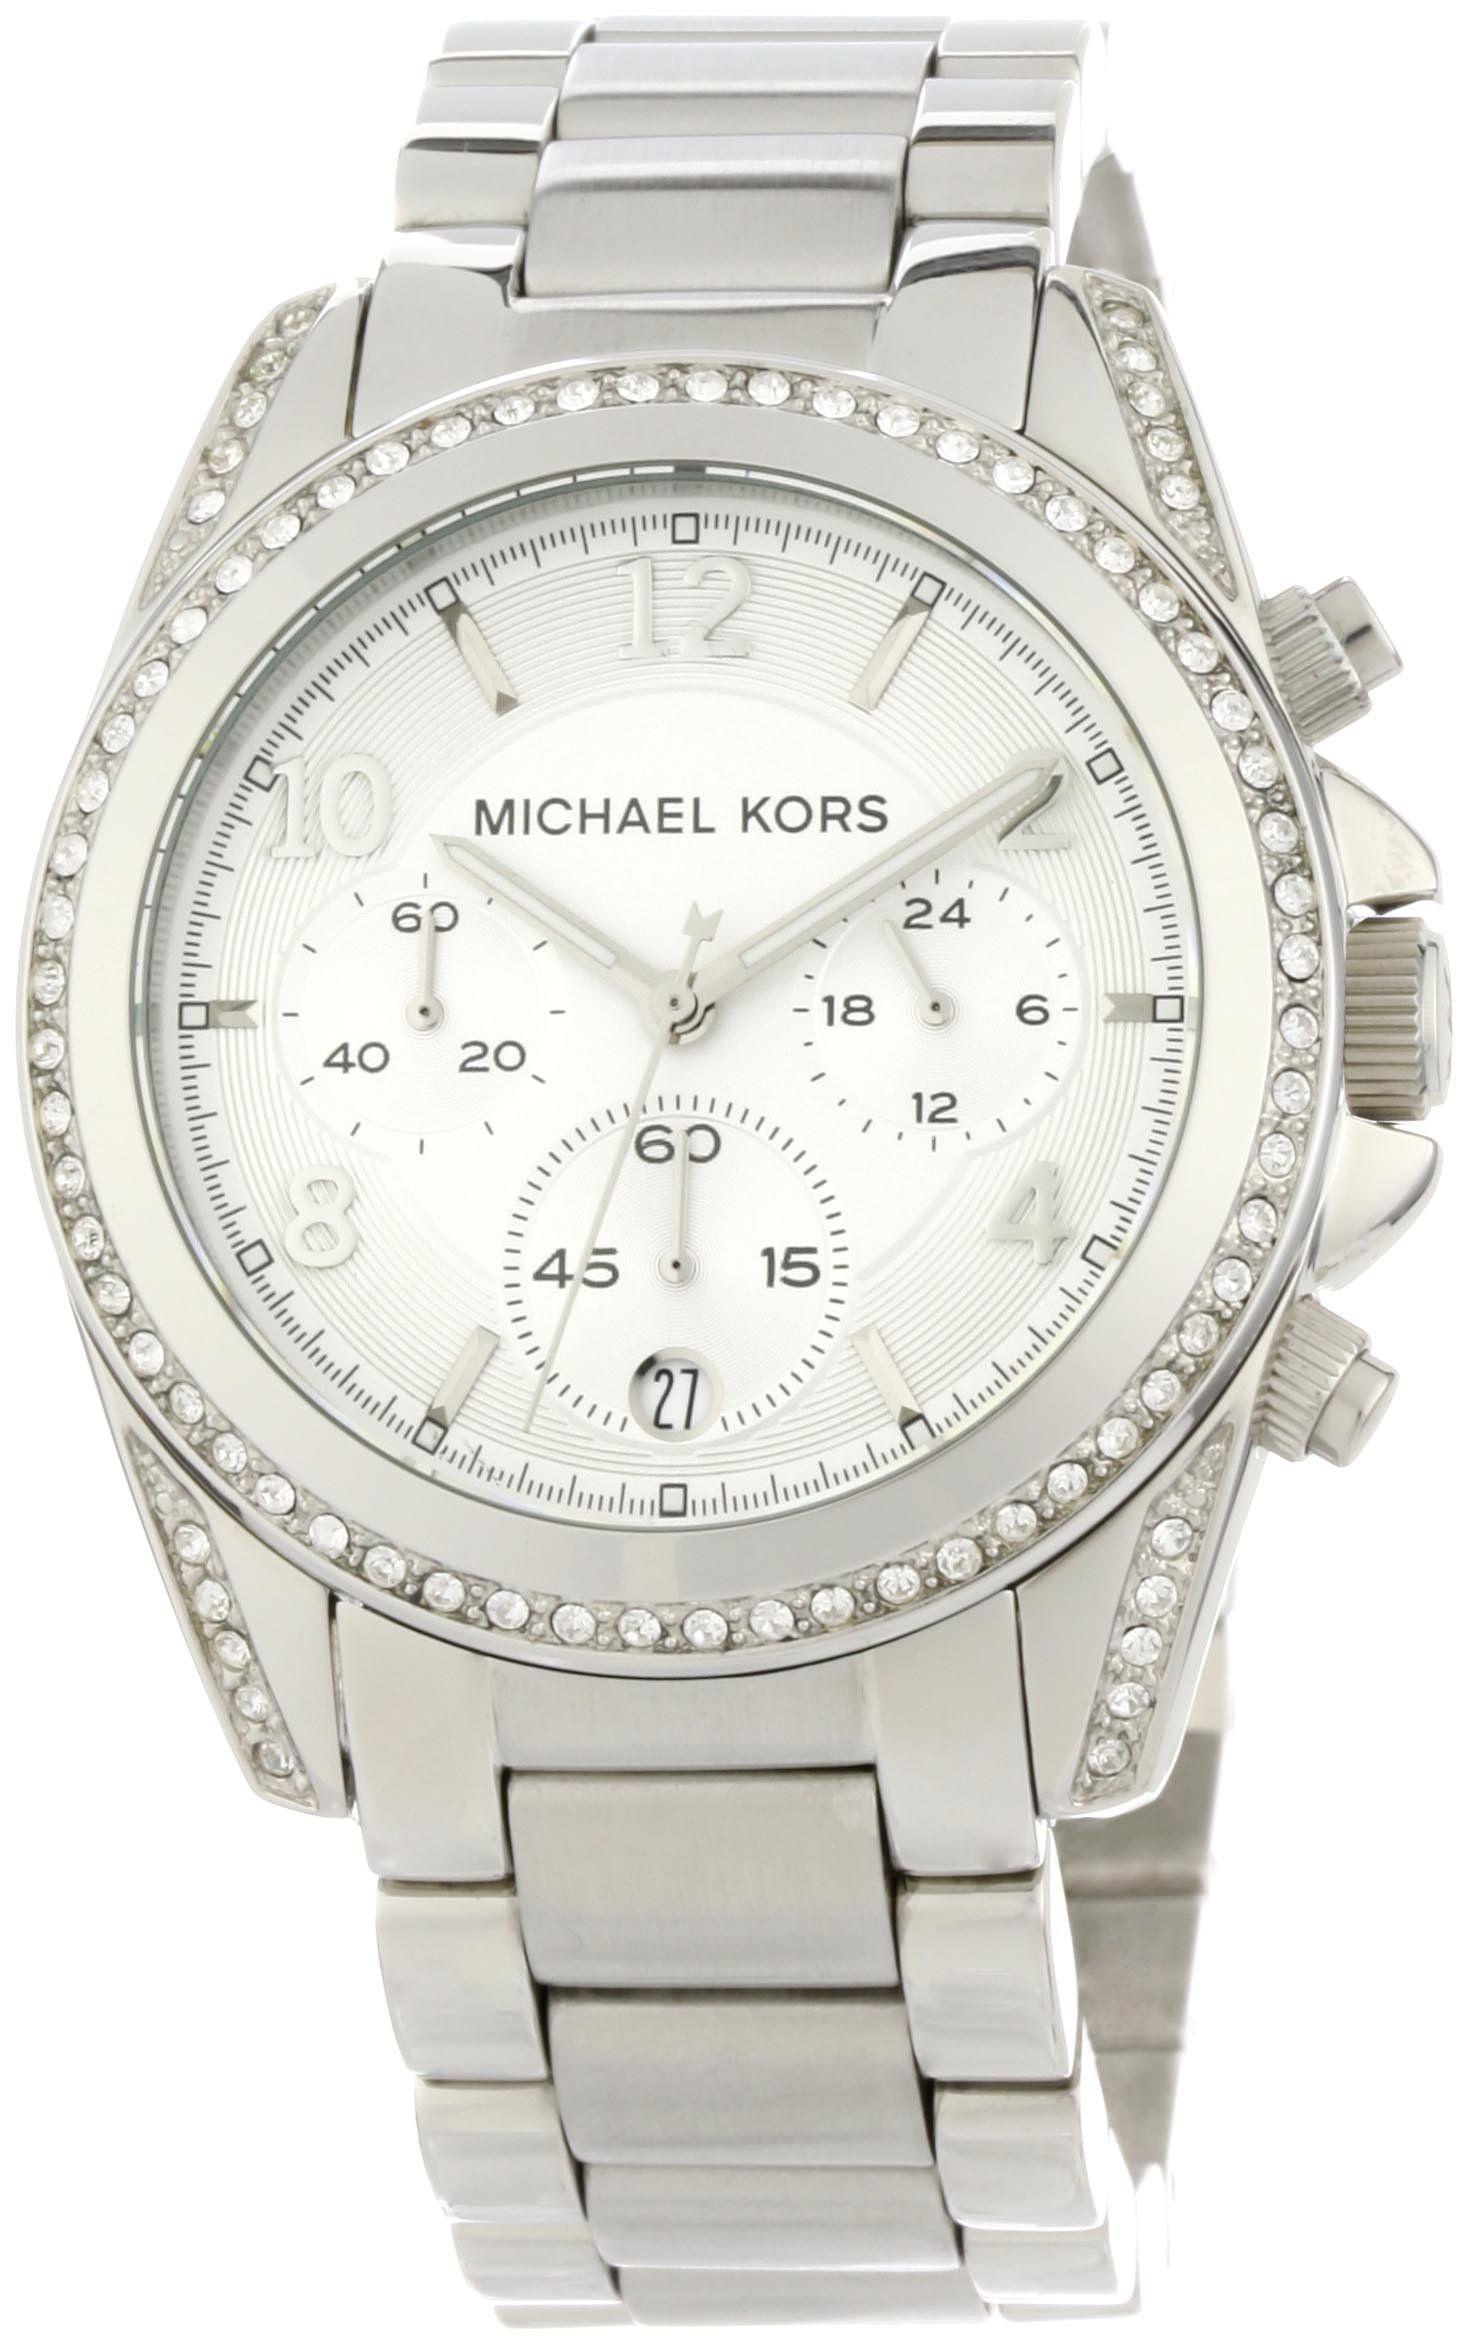 Michael Kors Women's MK5165 Silver Blair Watch